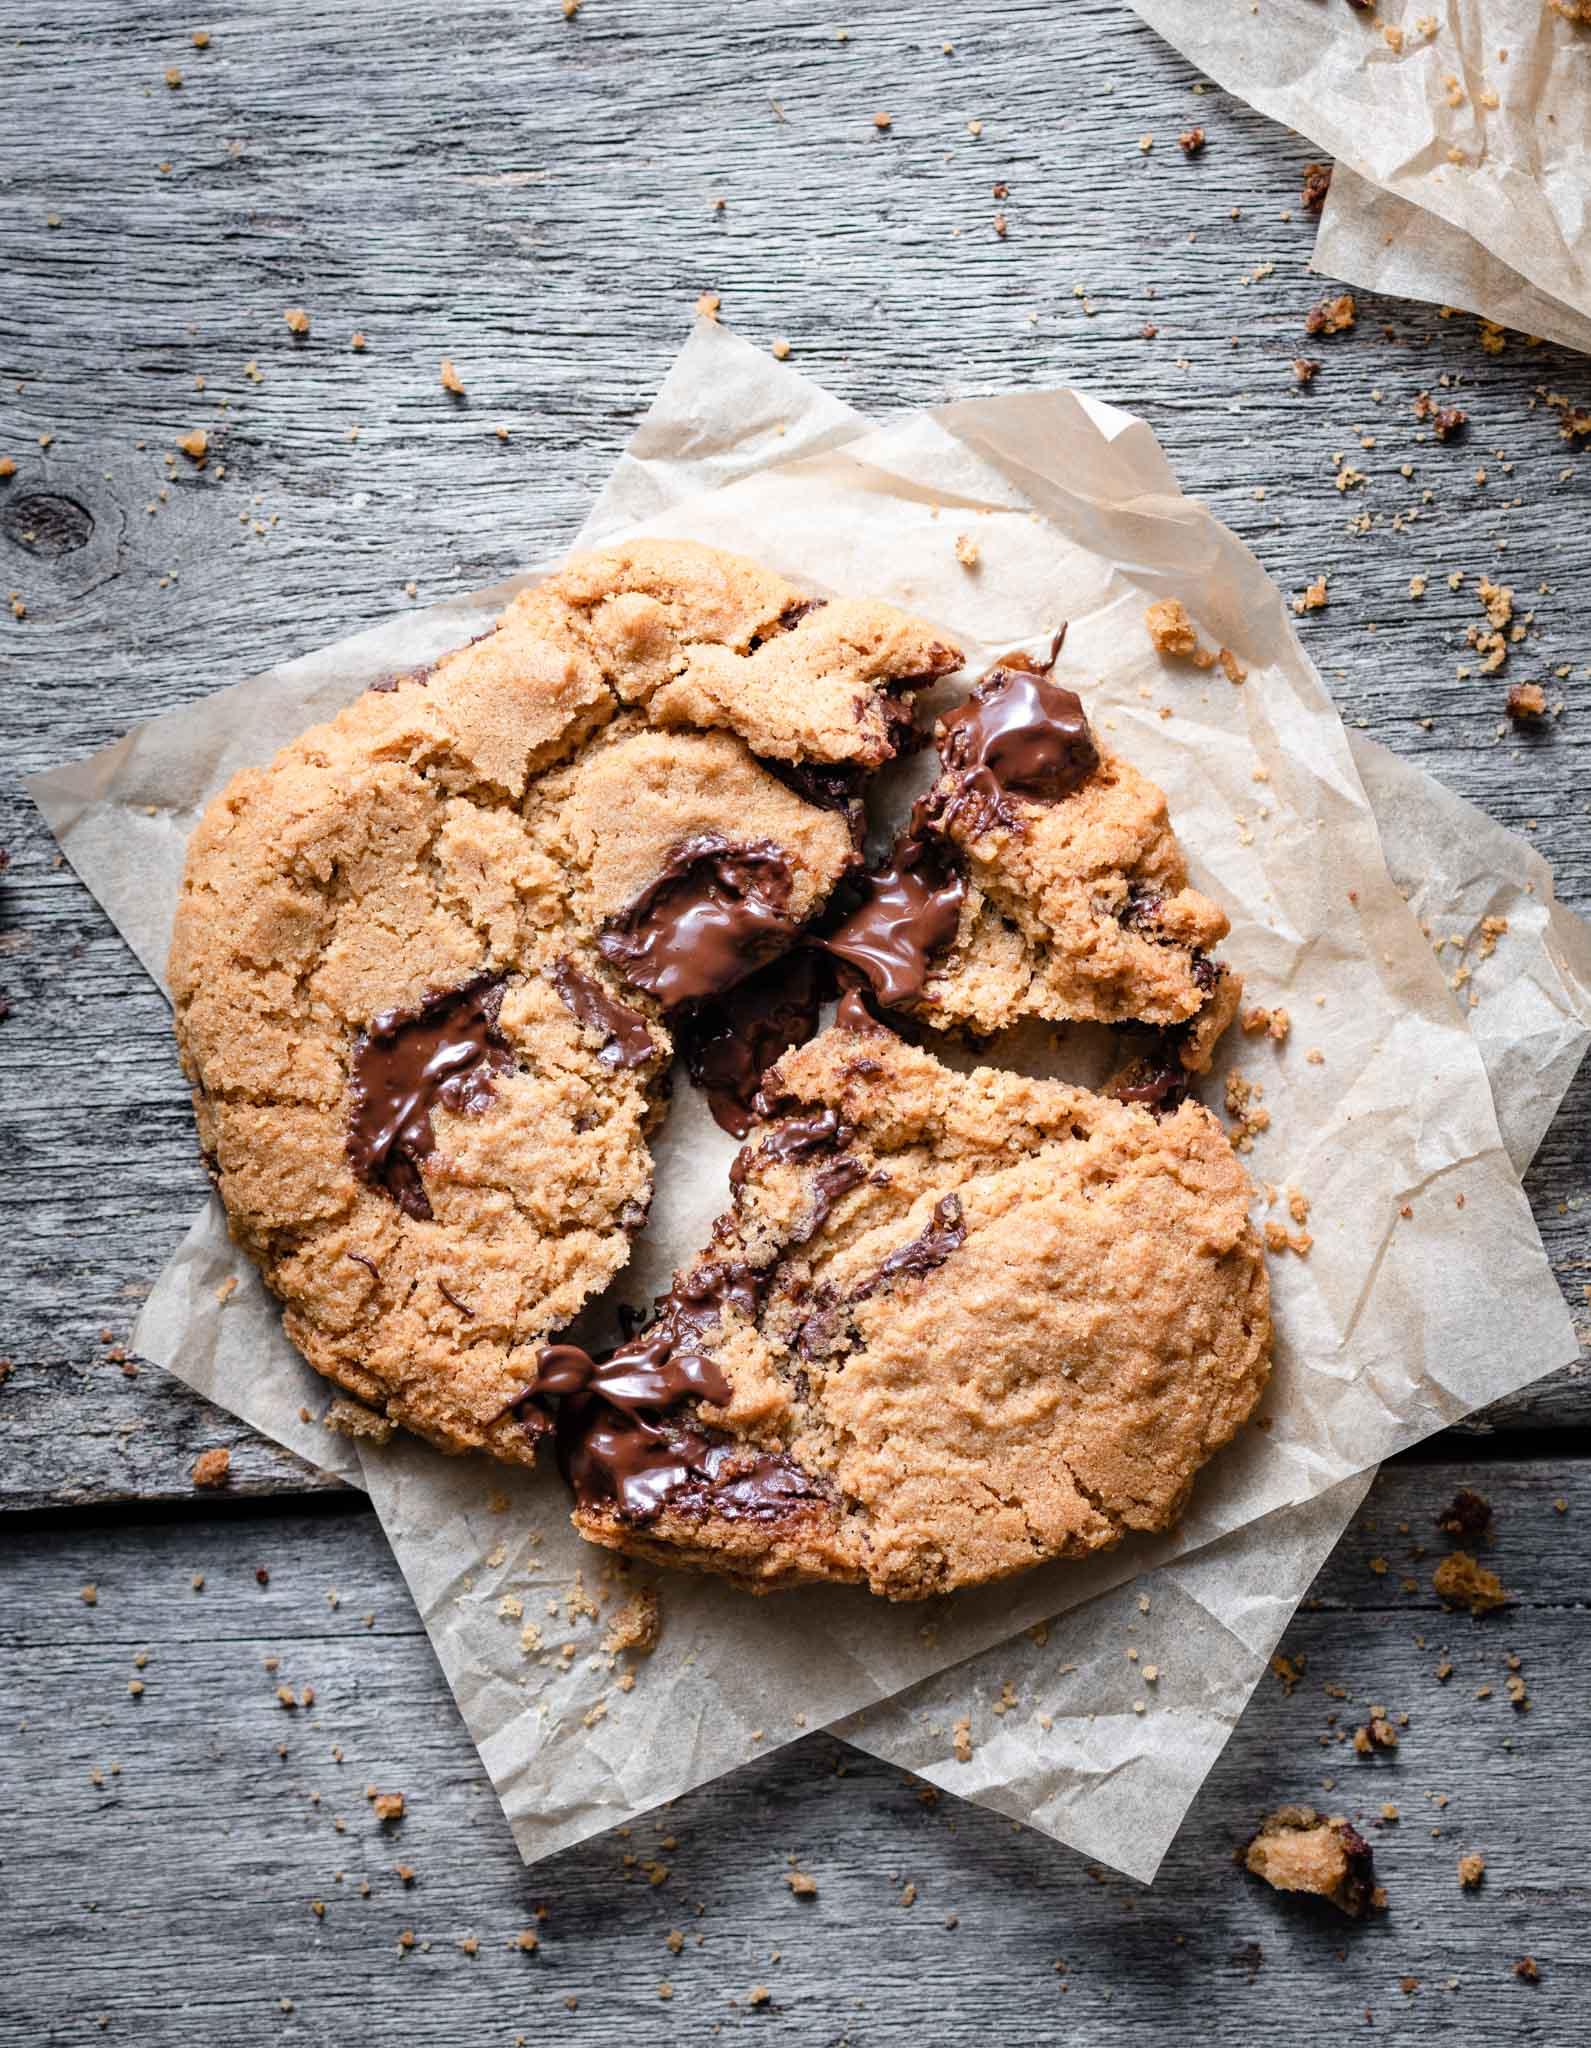 Gooey chocolate chip cookie.